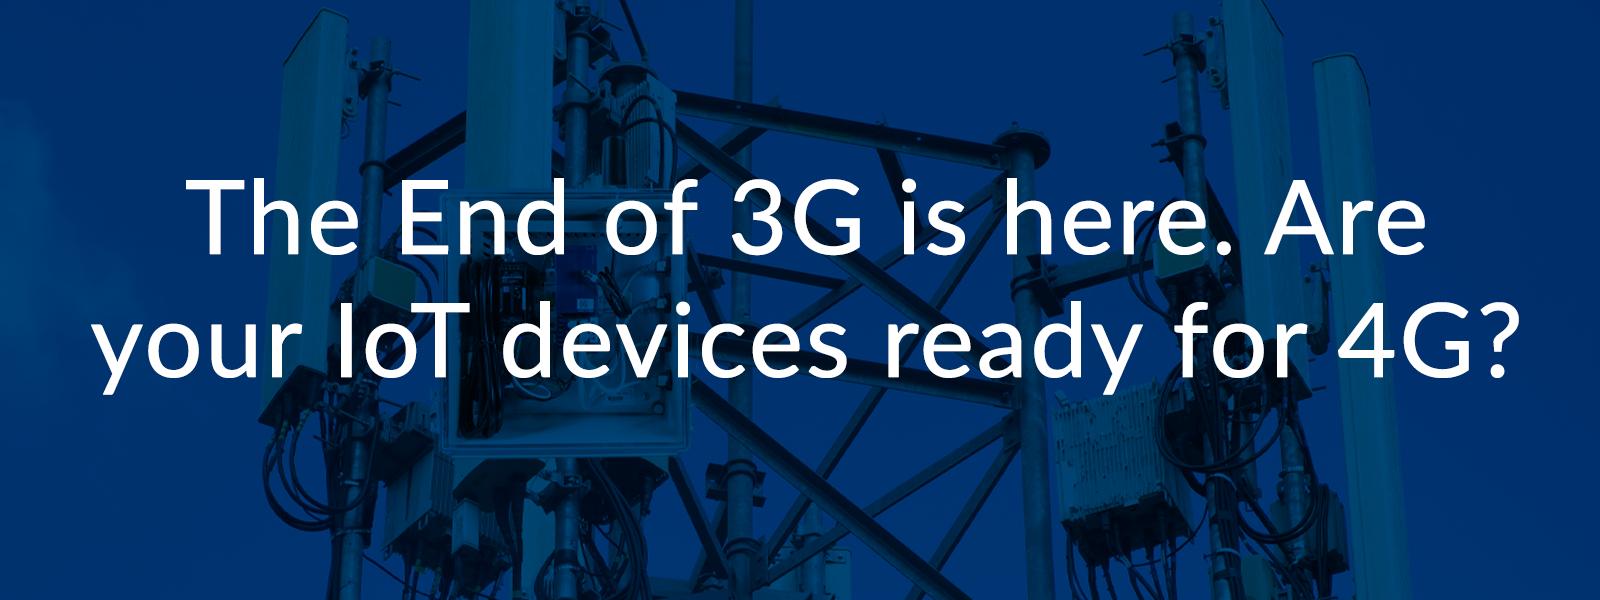 3G is near banner